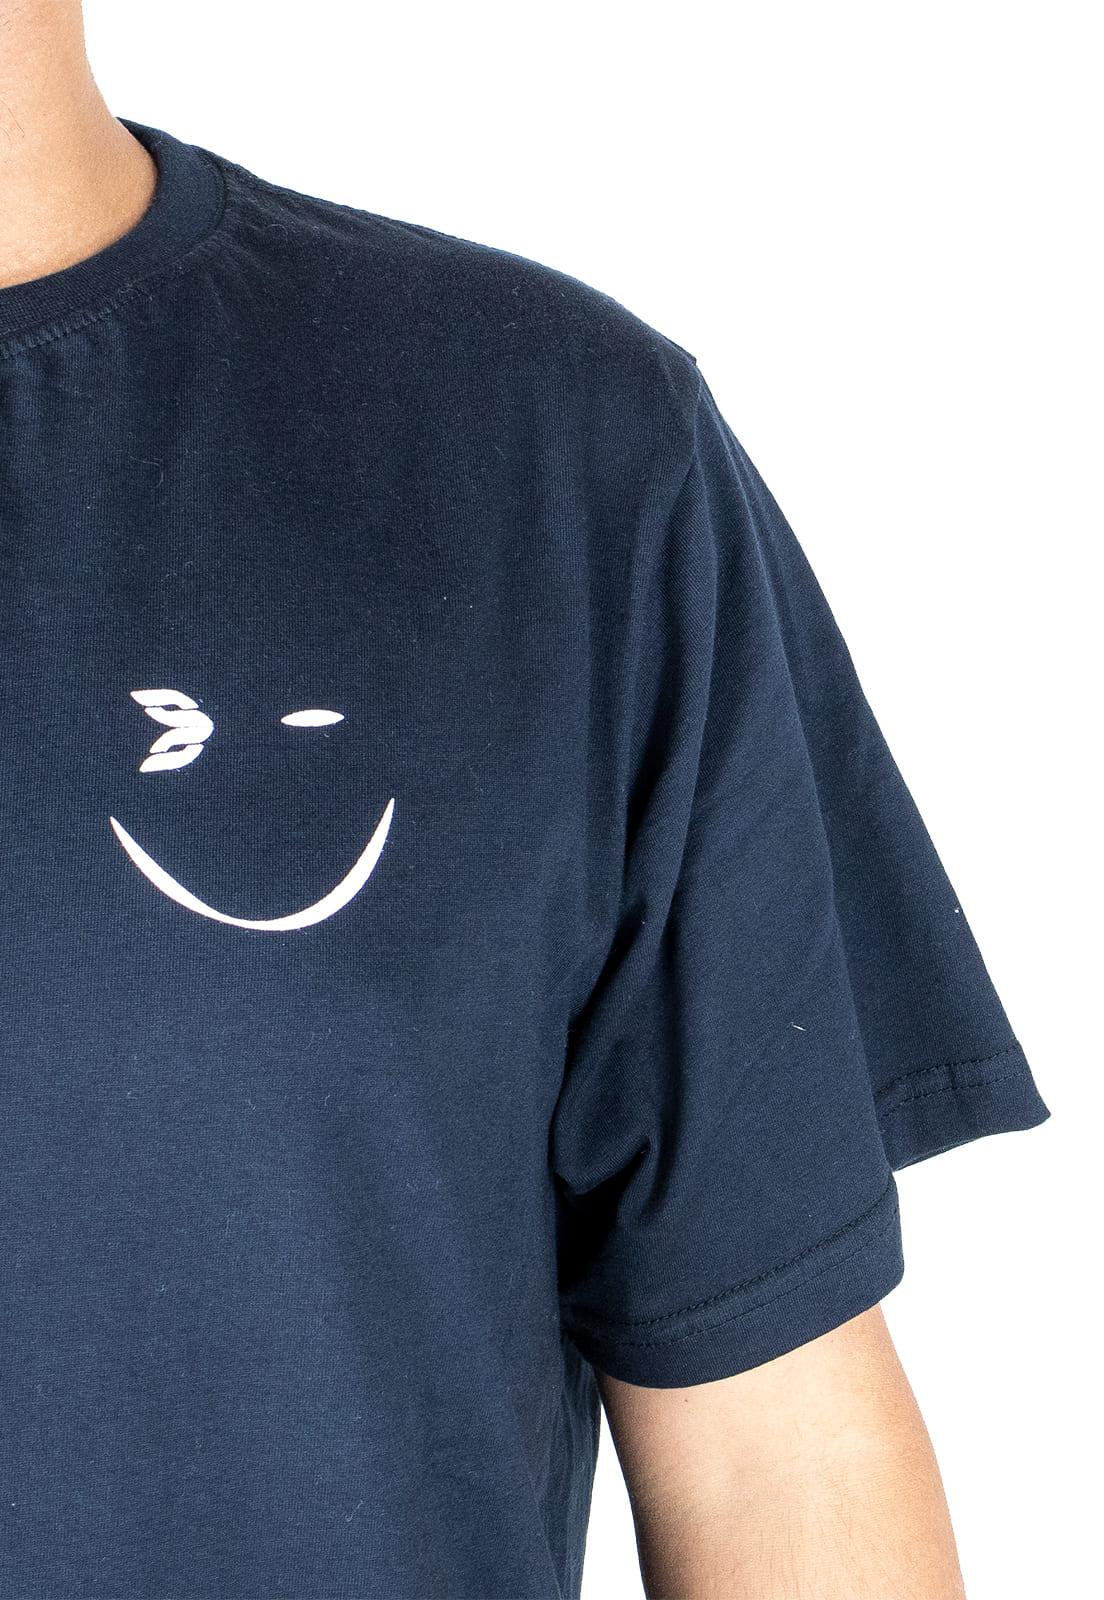 Camiseta Cisco Skate Clothing Happy